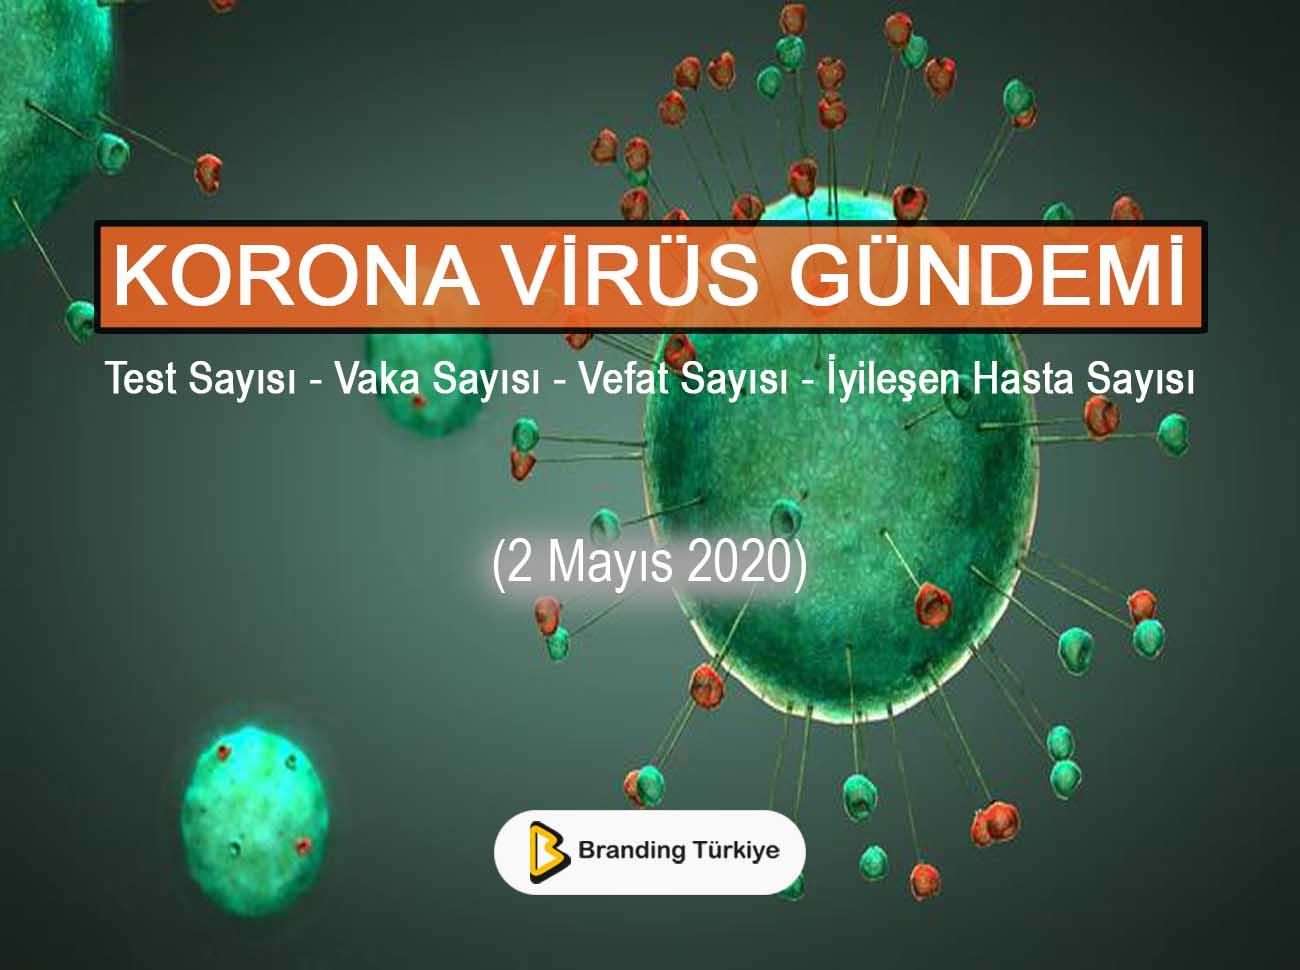 Korona Virüs Gündemi (2 Mayıs 2020)